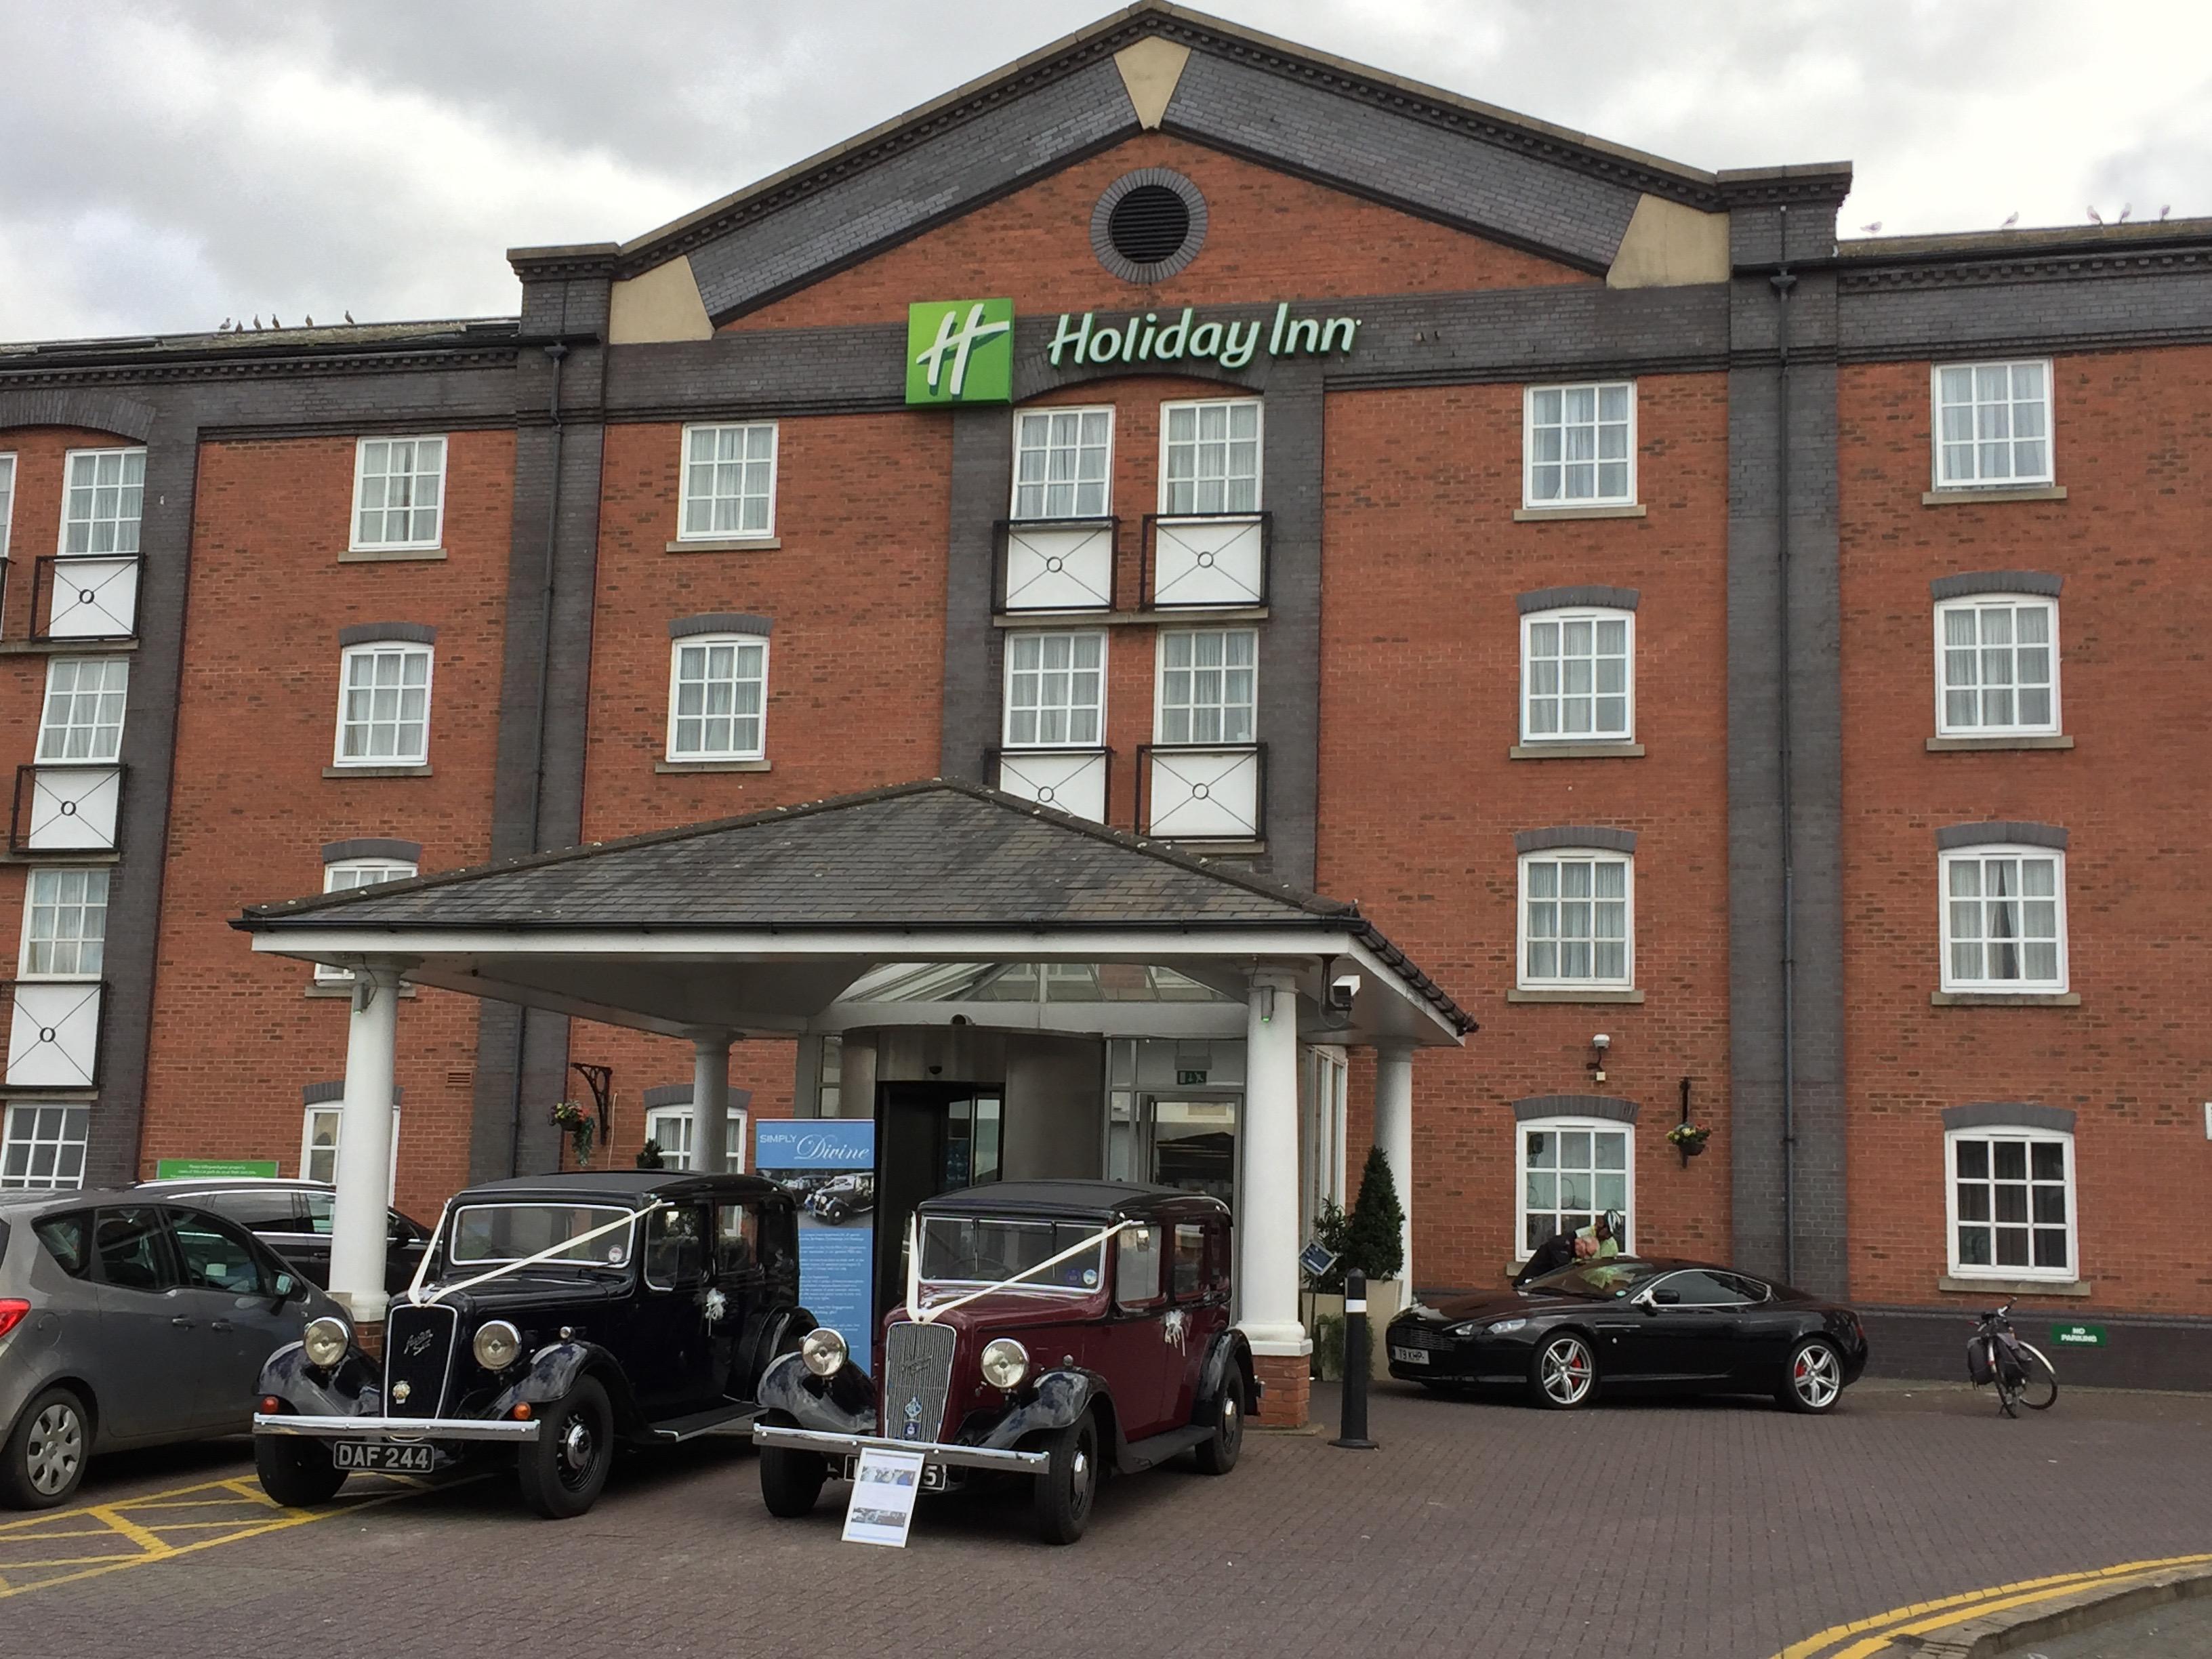 Holiday Inn in Ellesmere Port